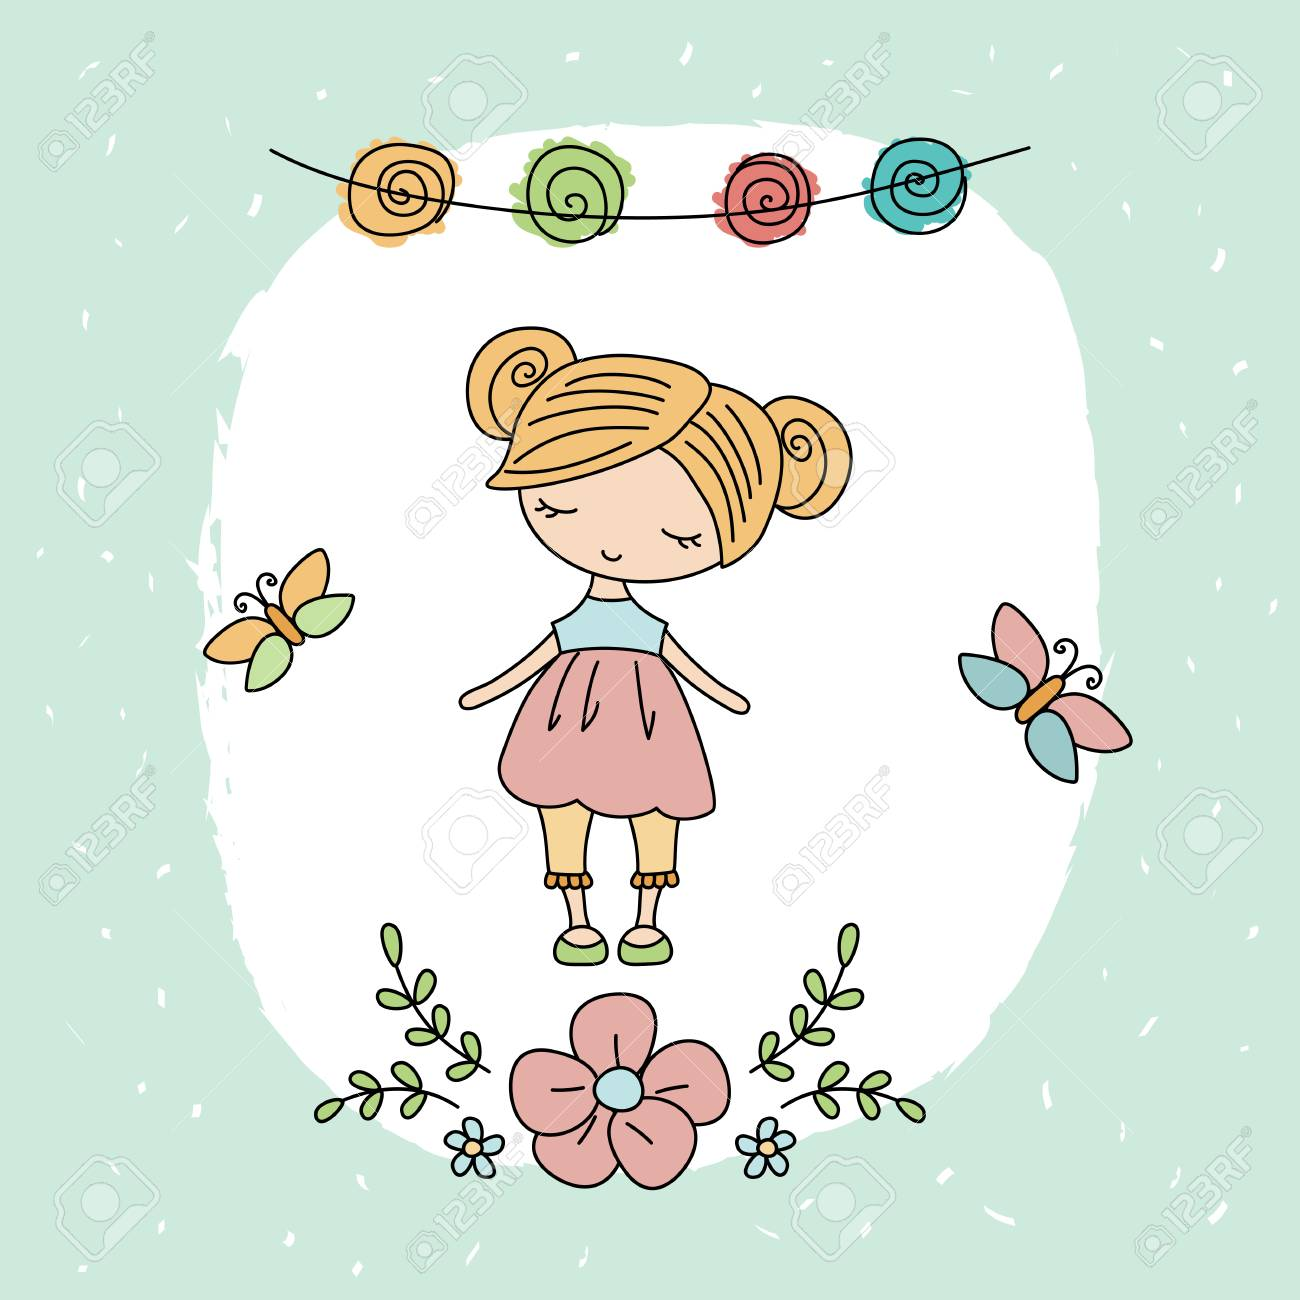 Jolie Petite Fille Carte De Voeux Avec La Petite Fille De Dessin Animé